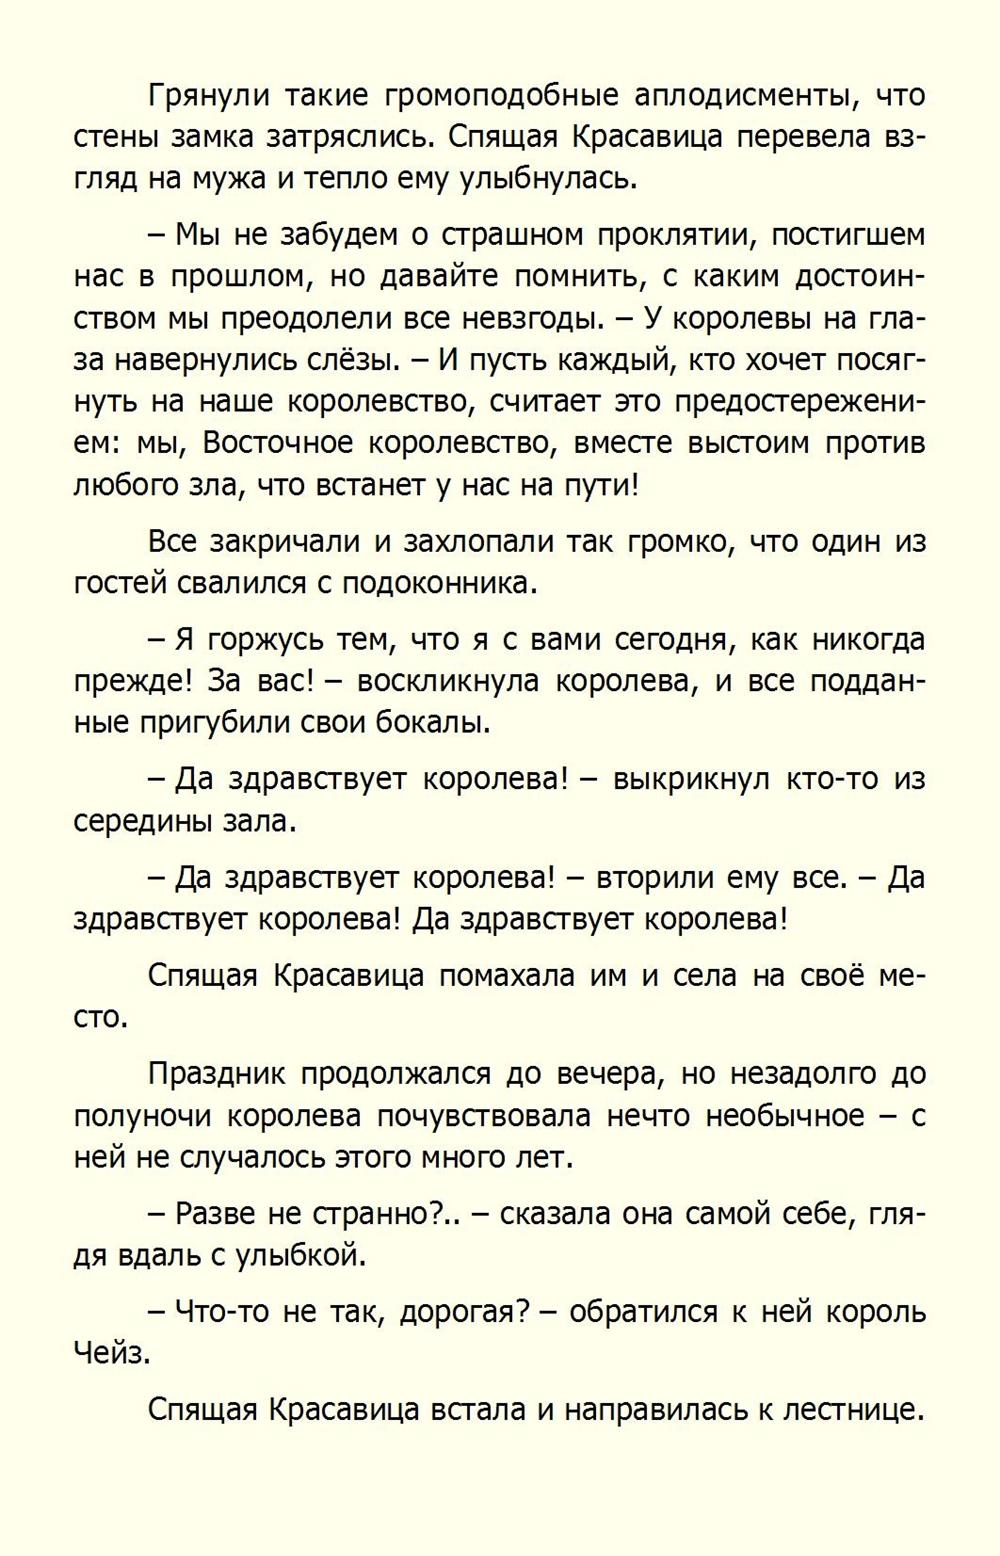 http://ipic.su/img/img7/fs/2.1597910021.jpg